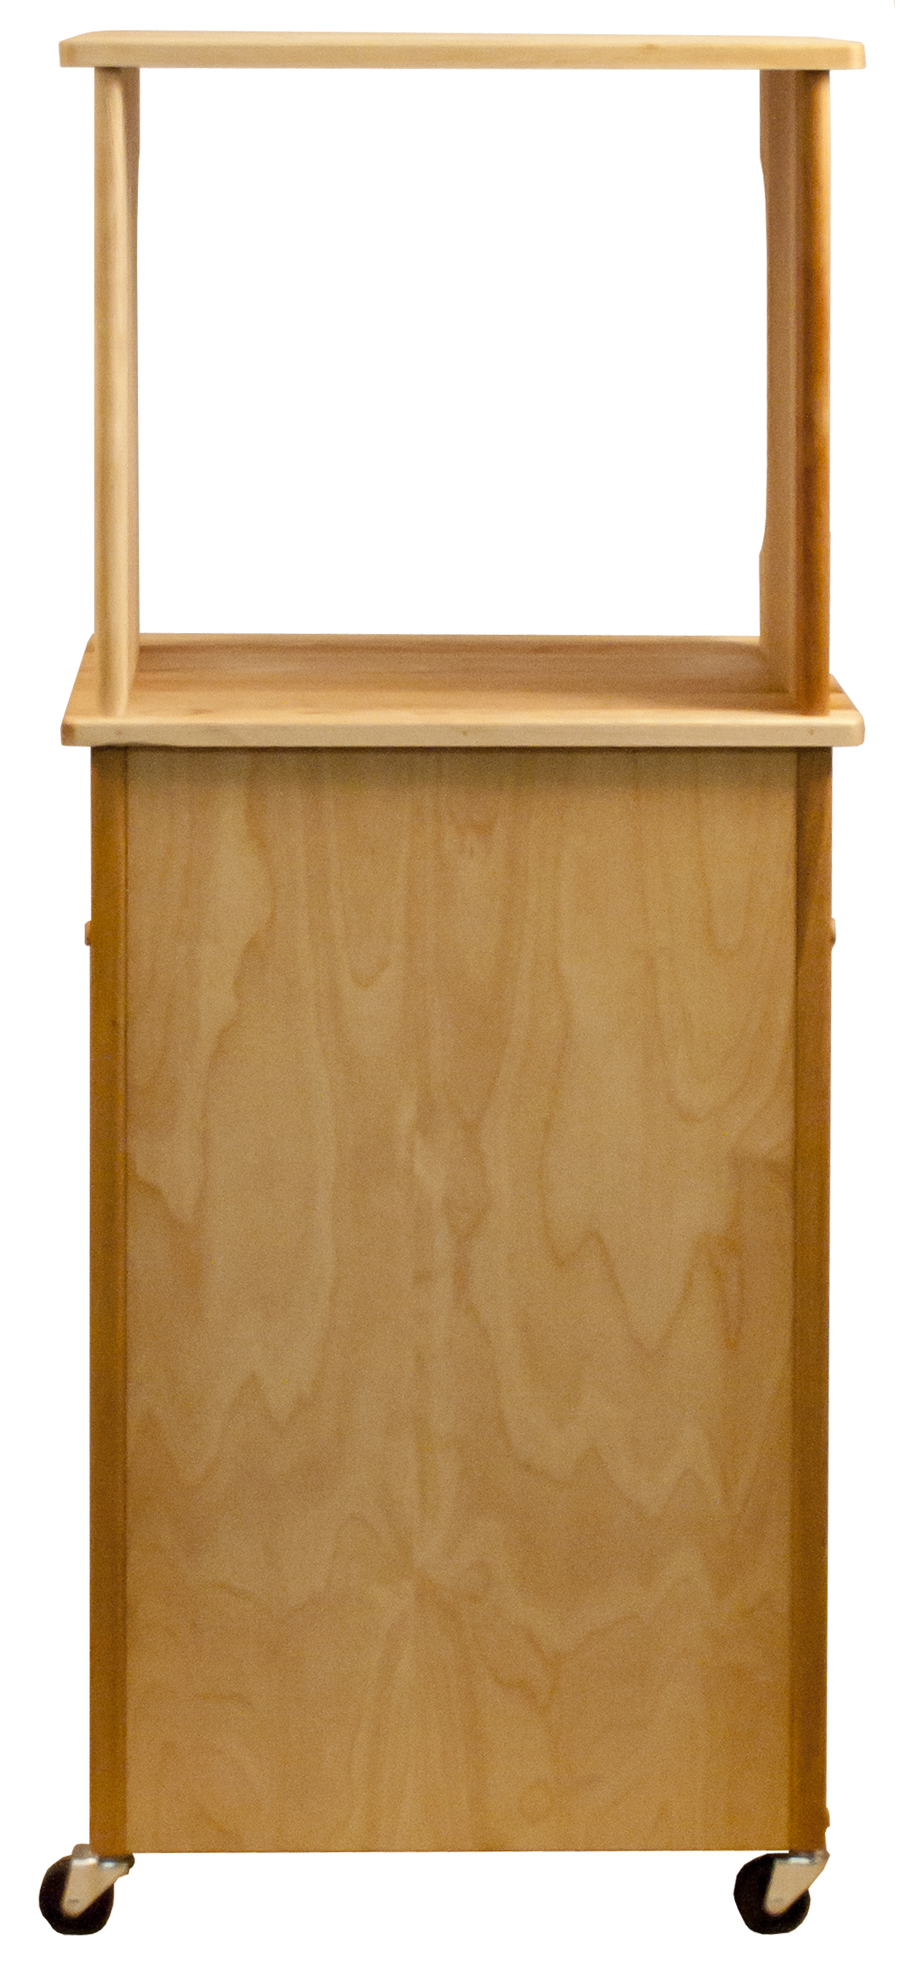 Catskill Microwave Cart Open Shelf Closed Cabinet